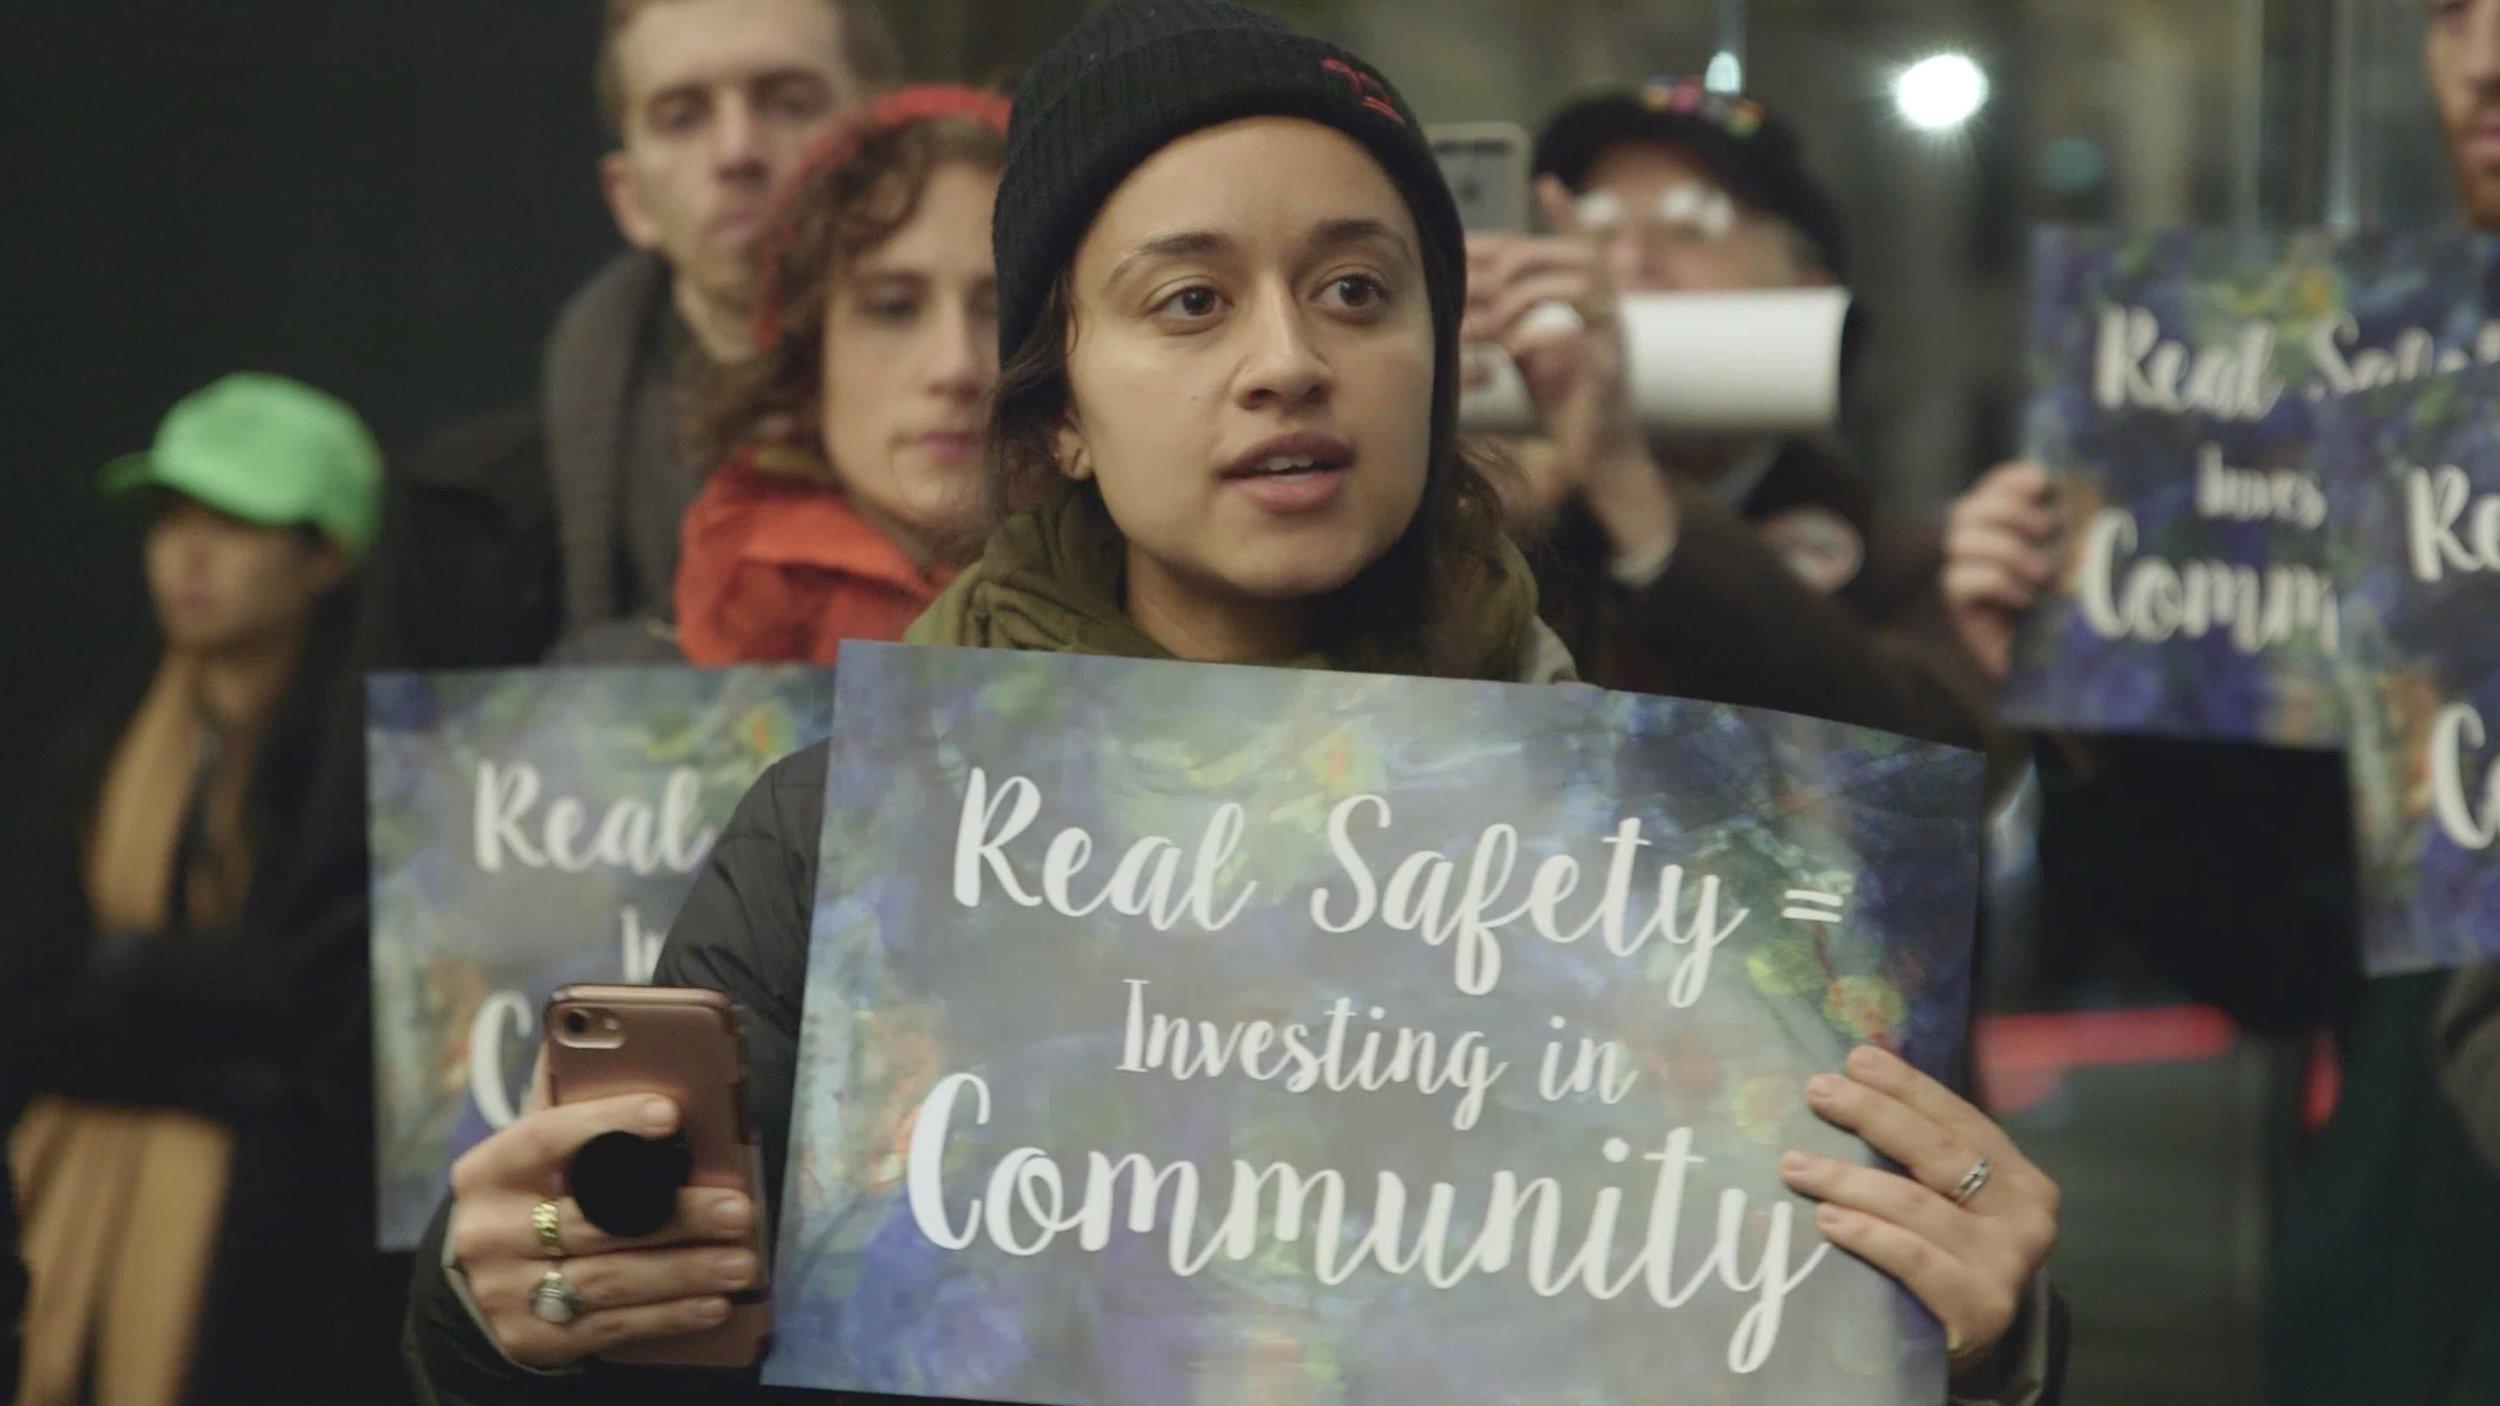 JVP-NYC to ADL: Stop the #DeadlyExchange